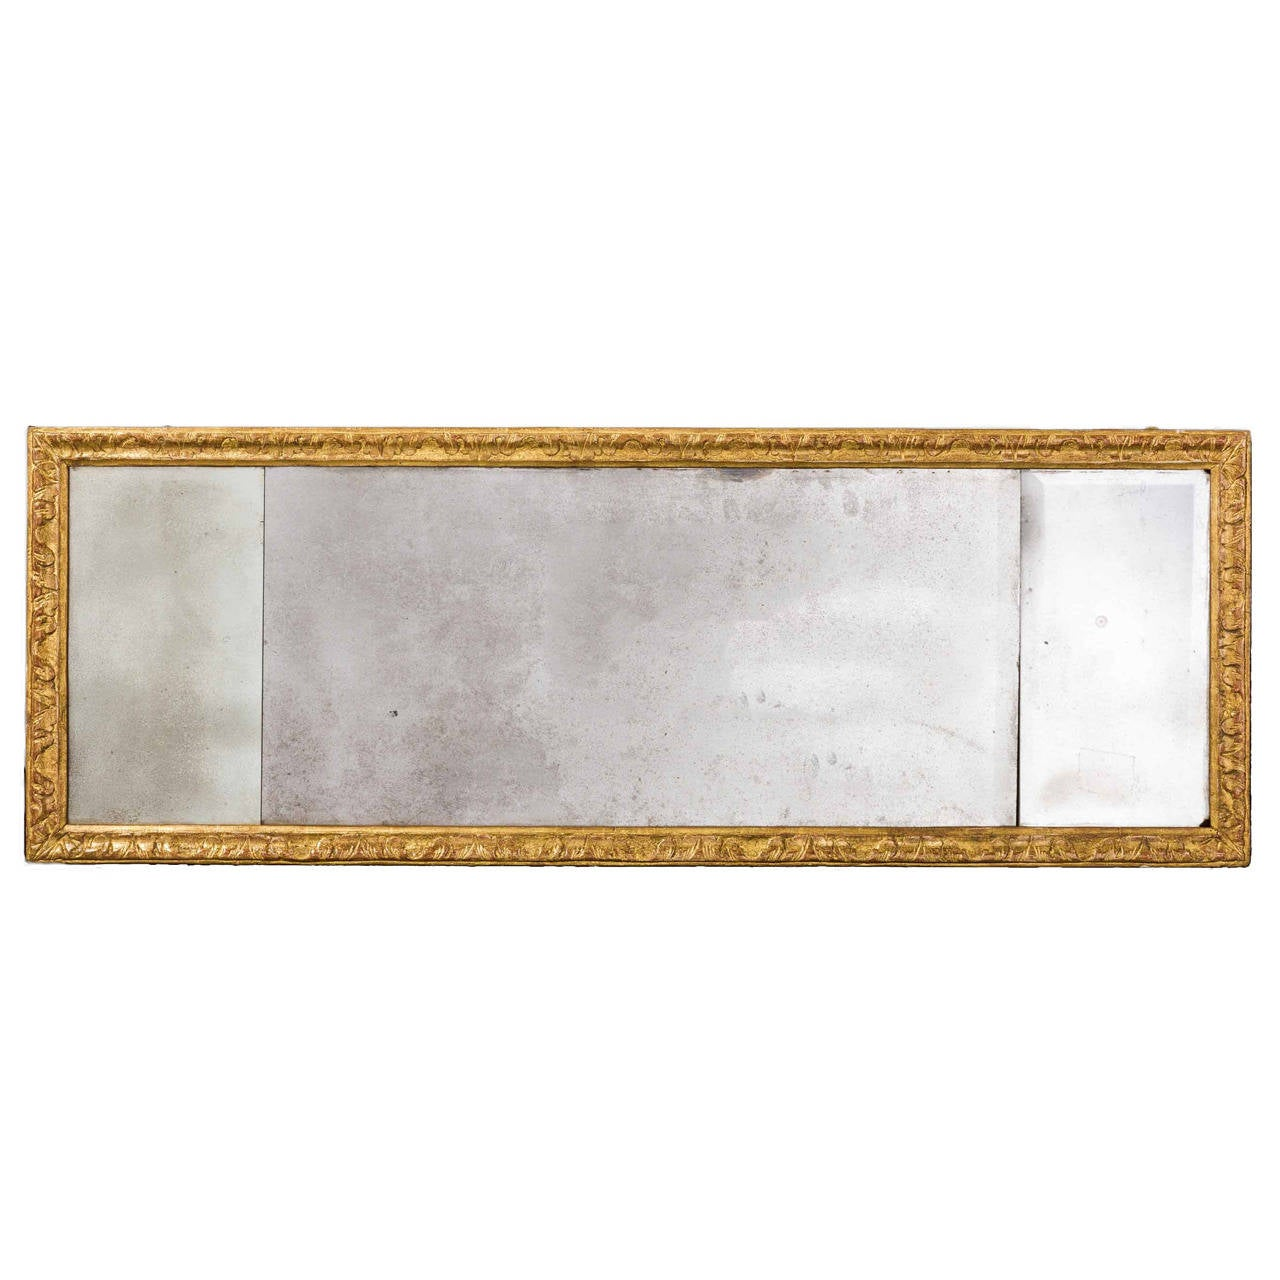 18th Century Queen Anne Period Landscape Mirror For Sale